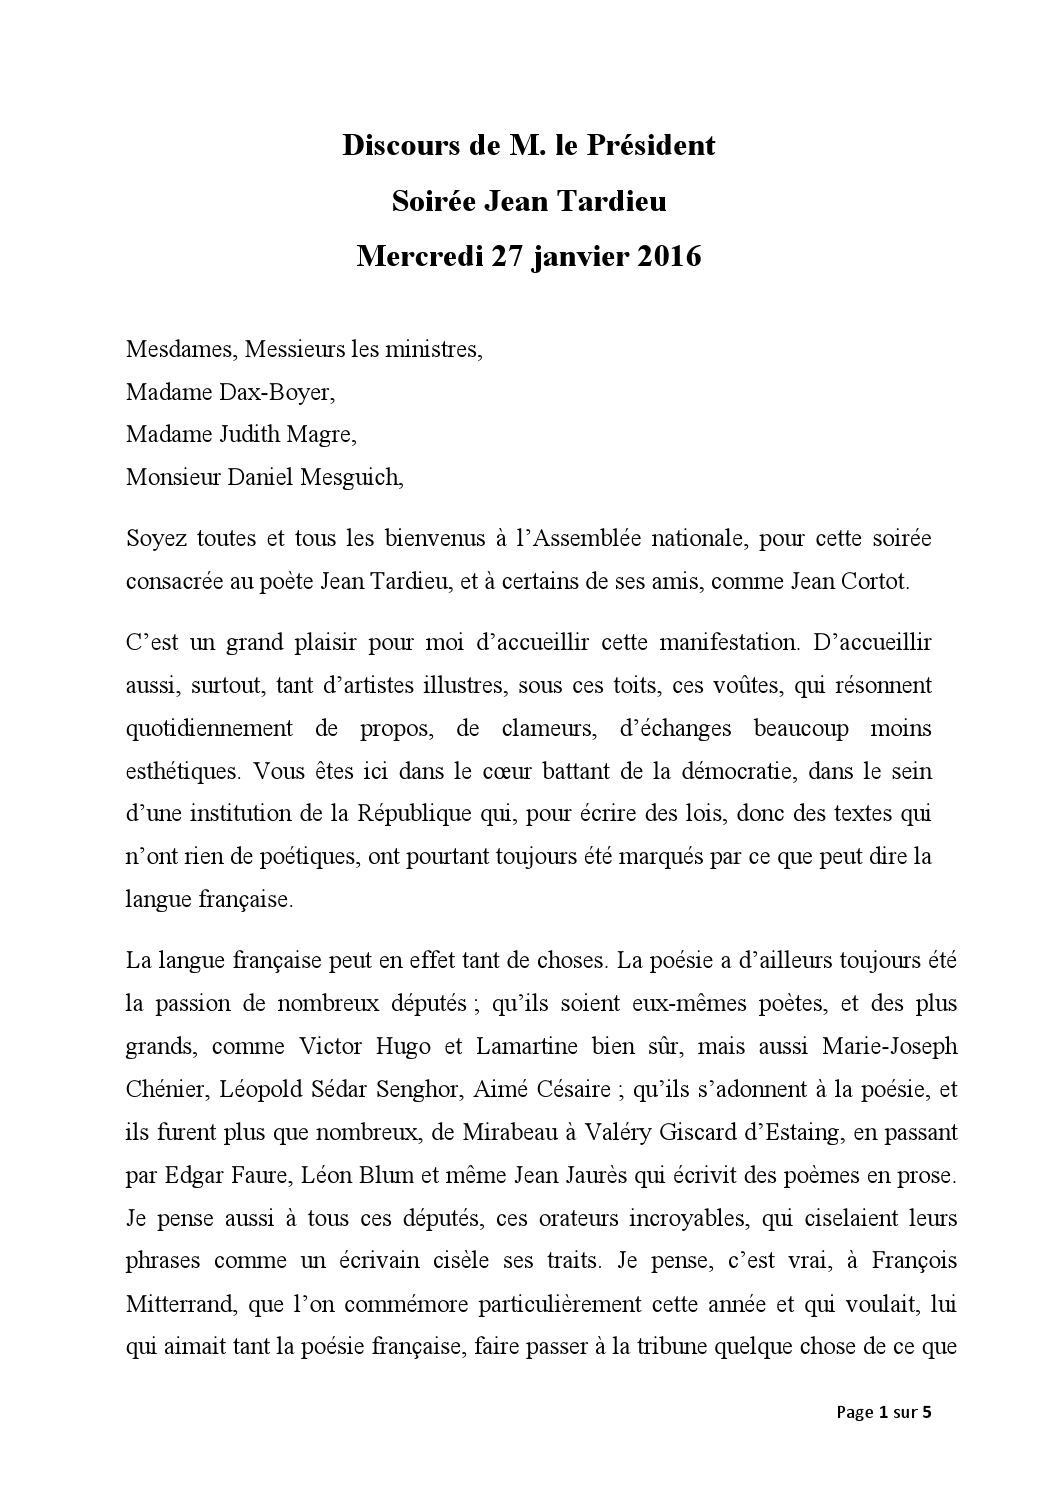 Discours Soirée Jean Tardieu By Claude Bartolone Issuu